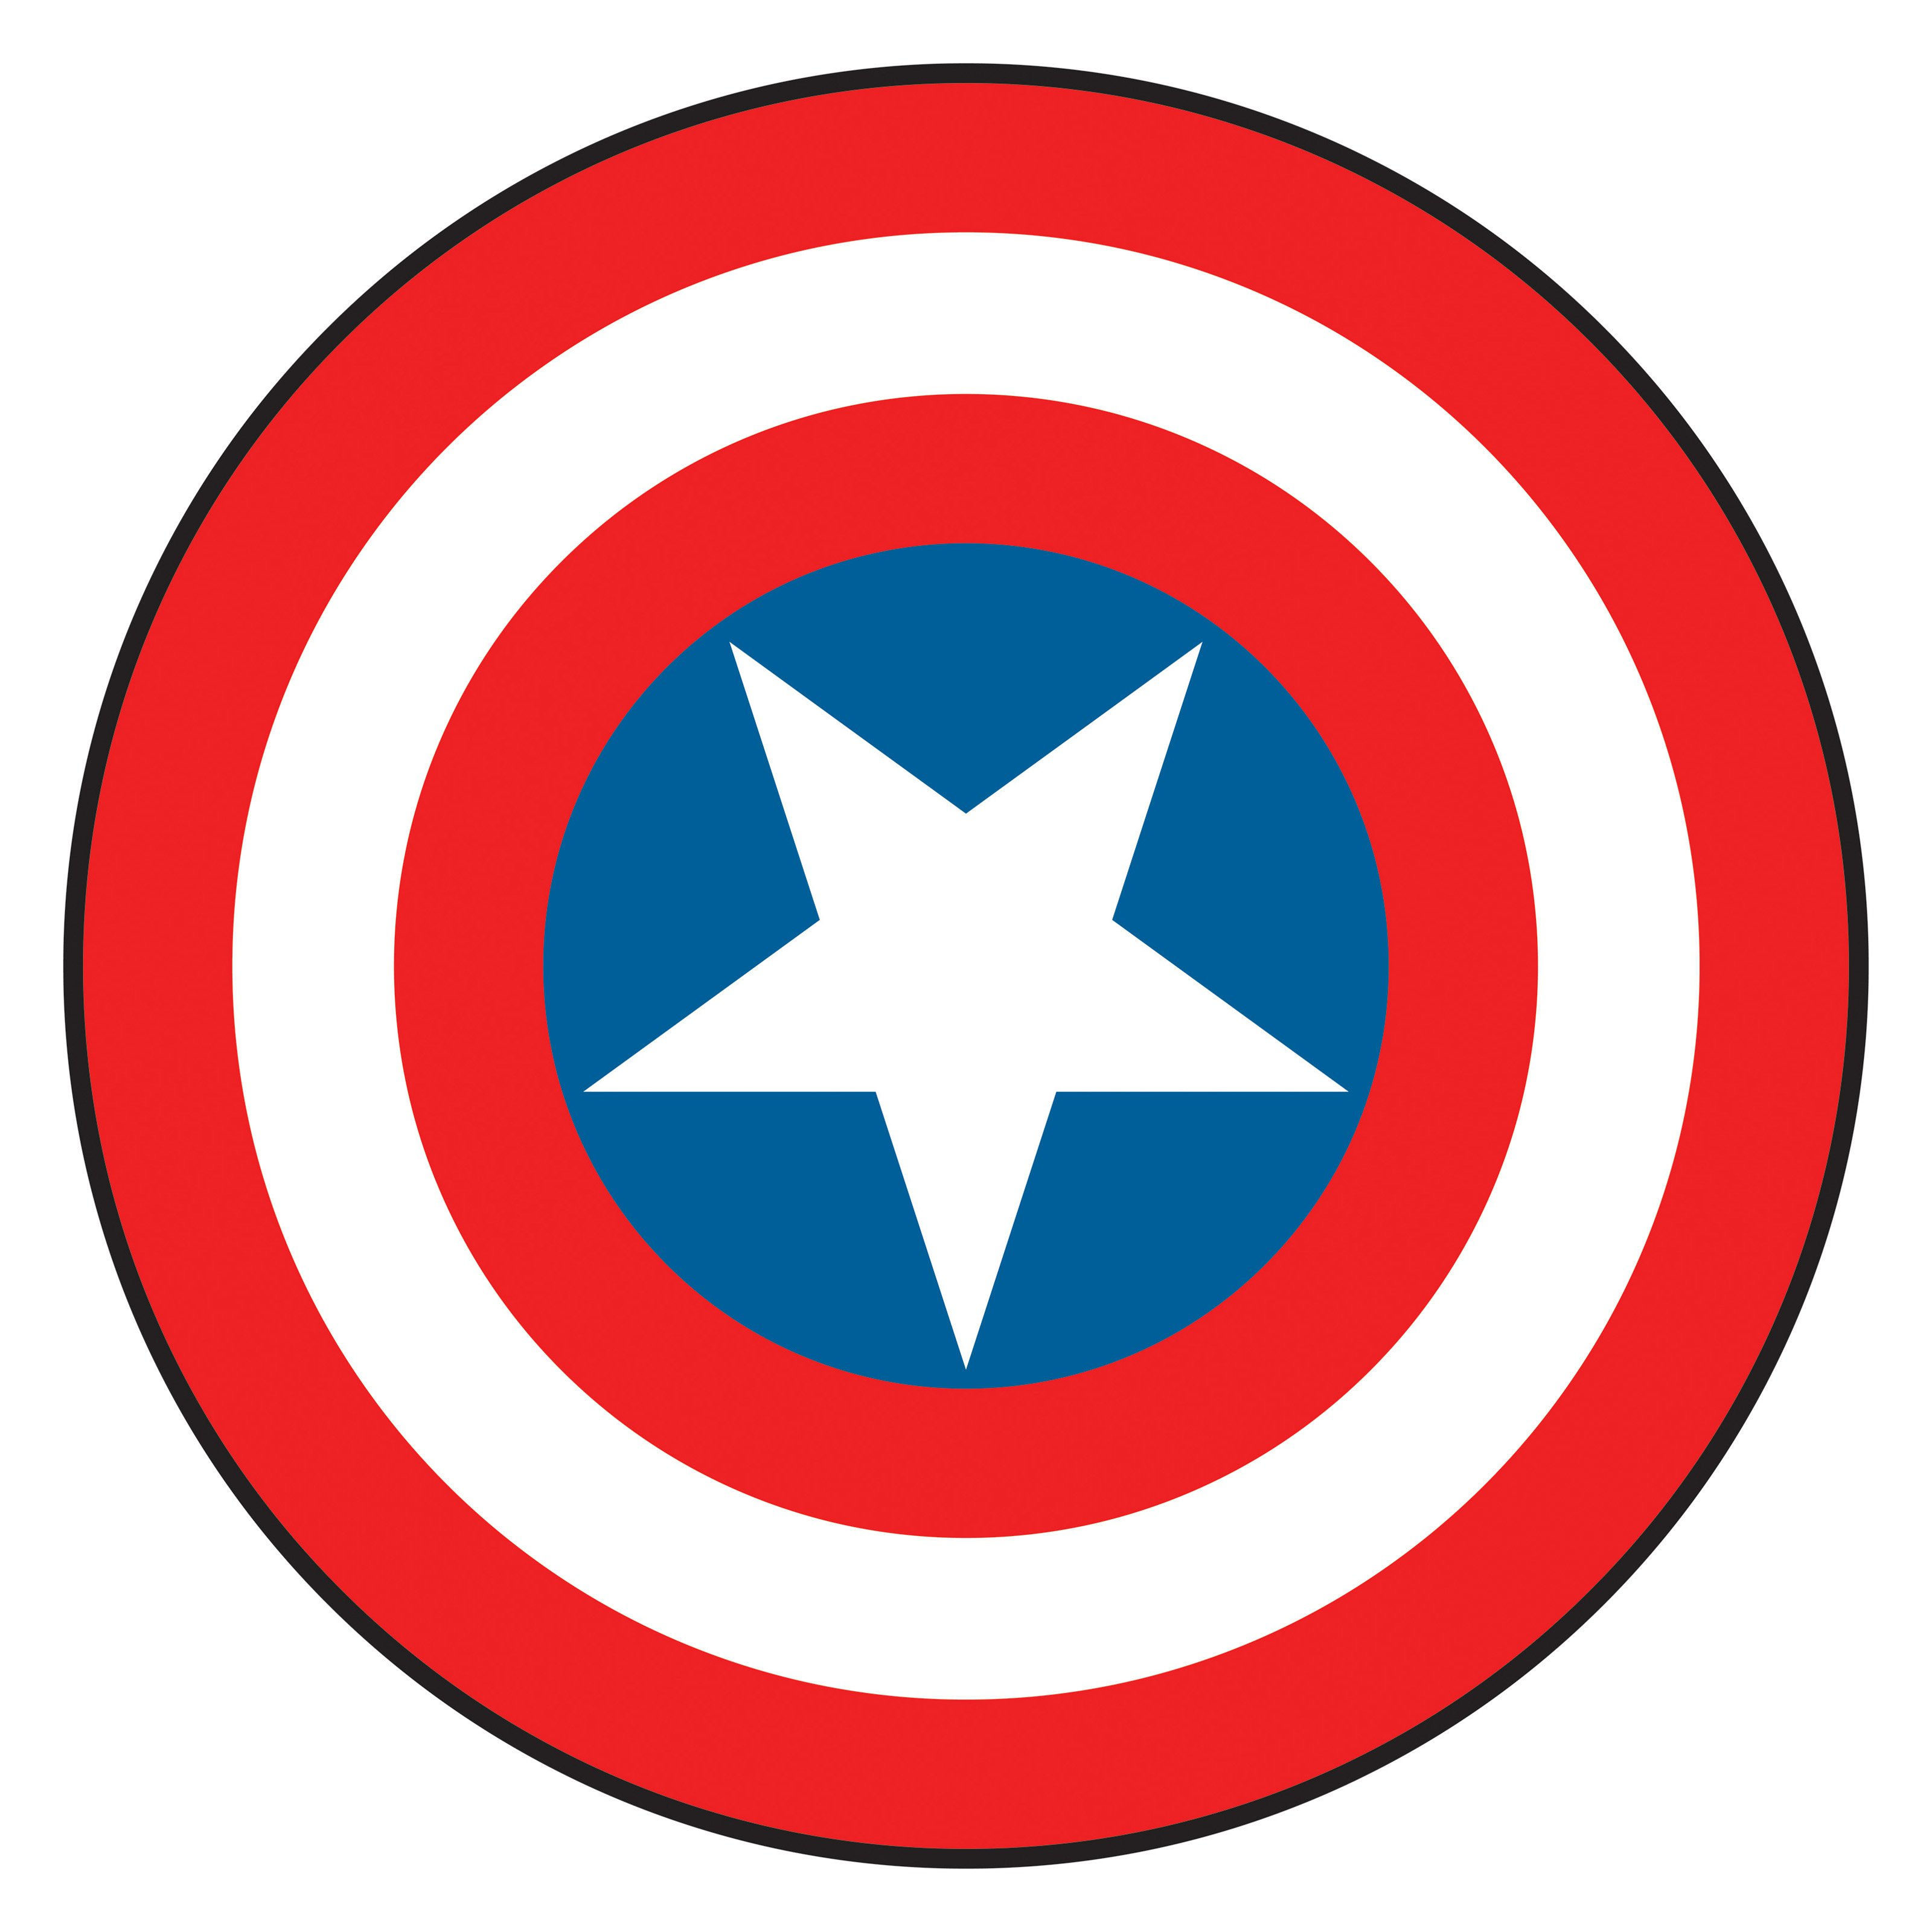 09bbec493a92e5082a8c4398af19ef ... 09bbe-09bbec493a92e5082a8c4398af19ef ... 09bbec493a92e5082a8c4398af19ef ... ... Captain America Clipart .-2